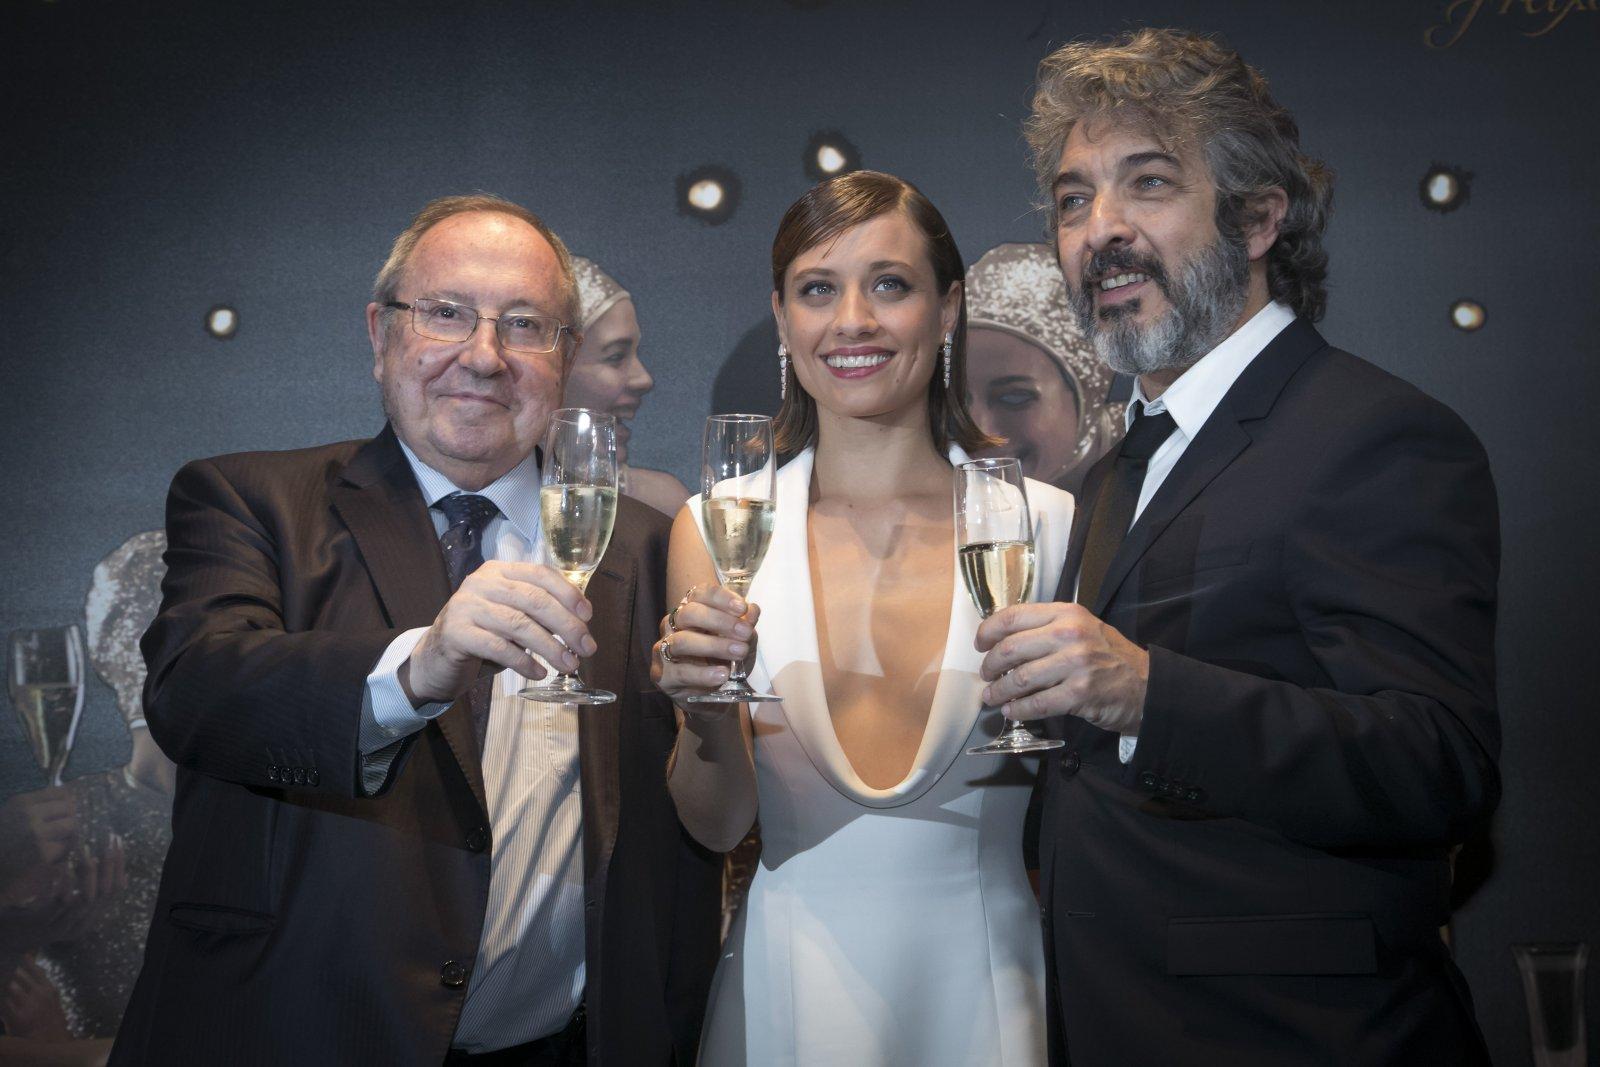 José Luís Bonet, Michelle Jenner i Ricardo Darín